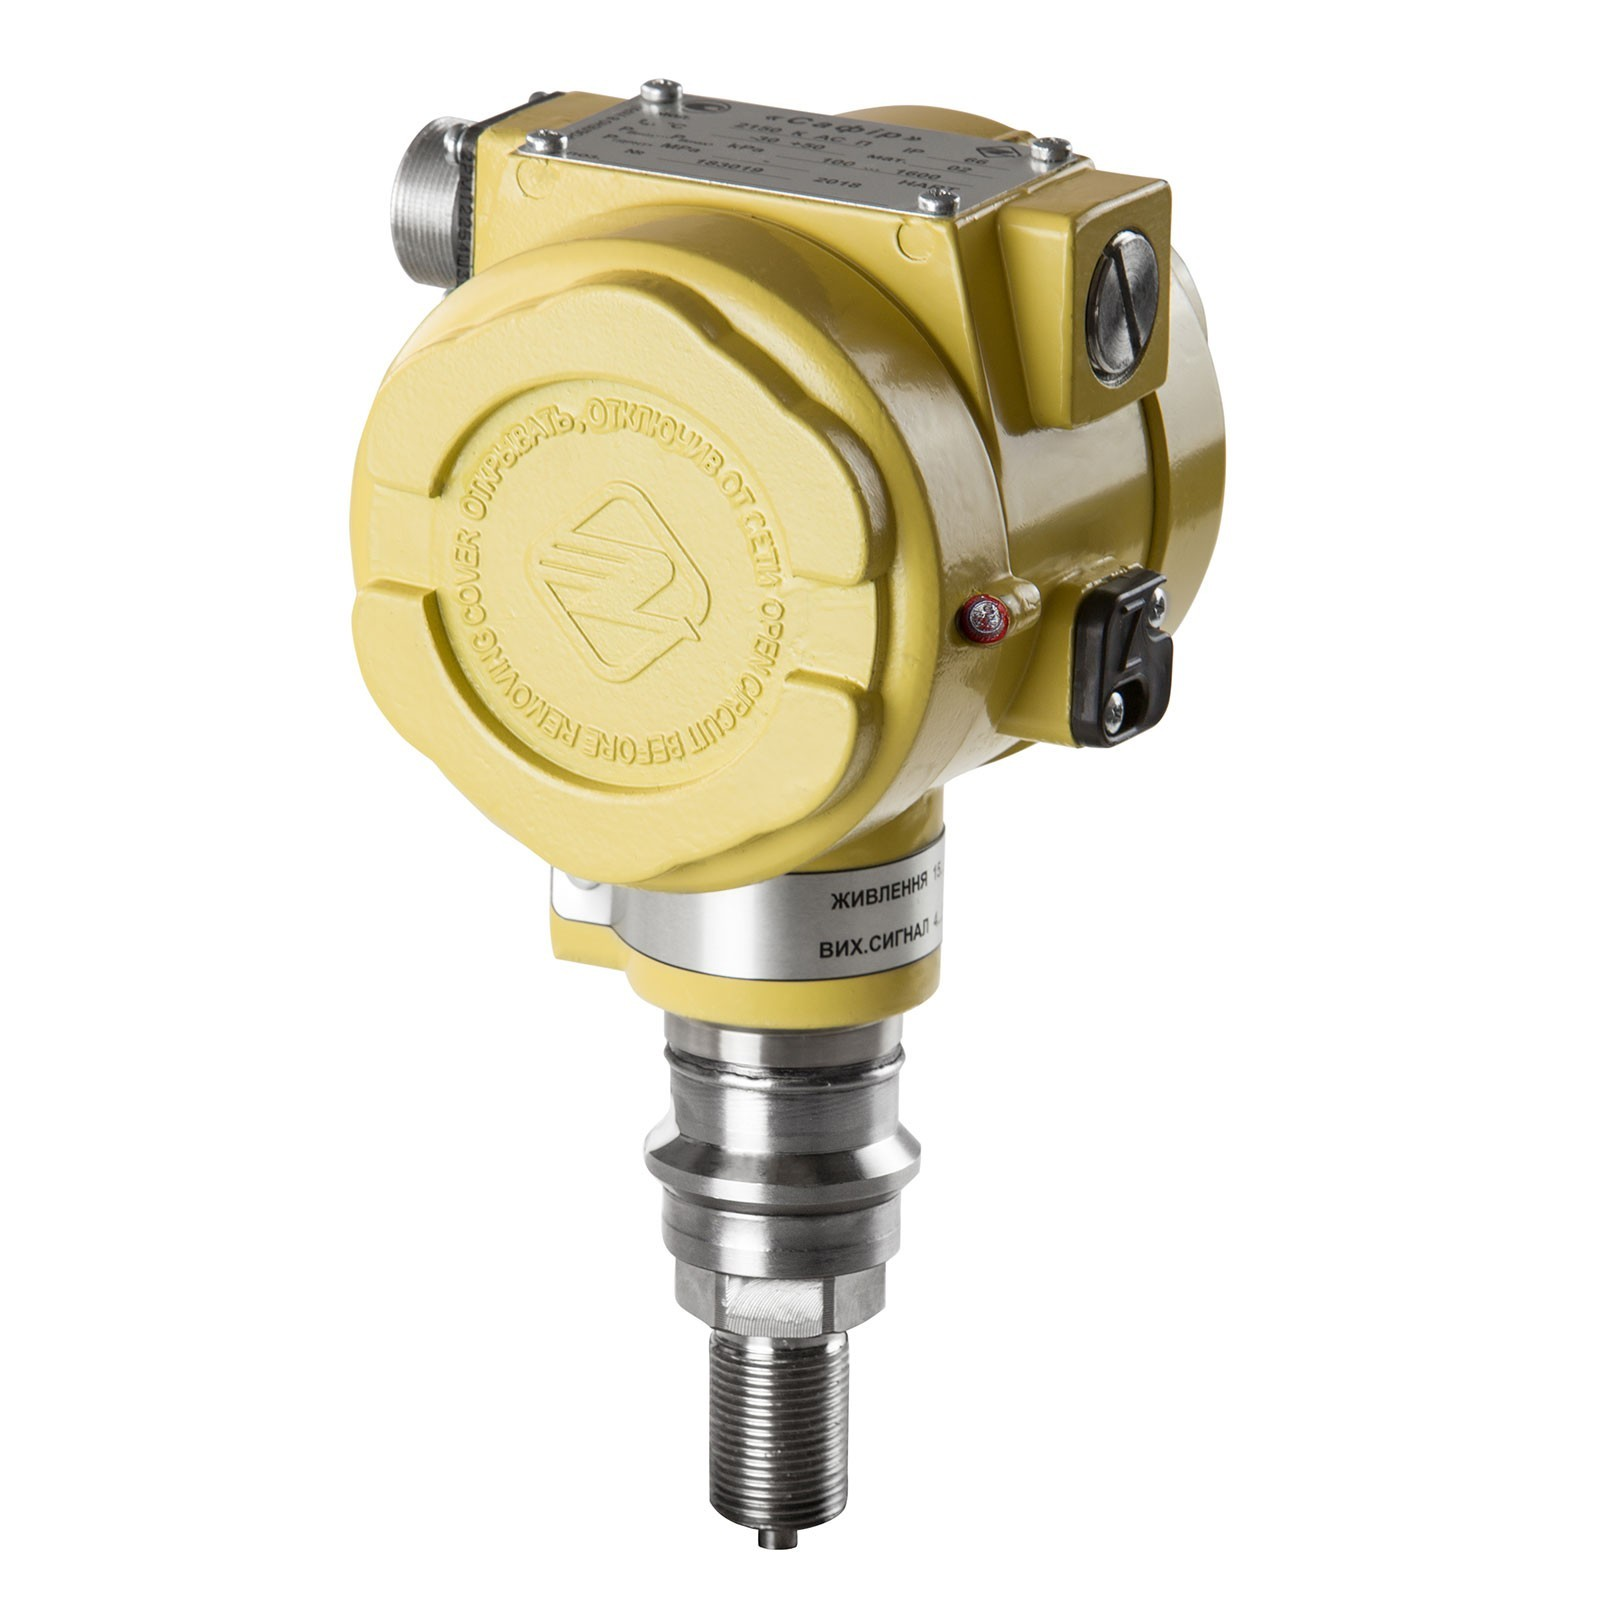 Analog Absolute Pressure Transmitters Safir 2030, 2040, 2050